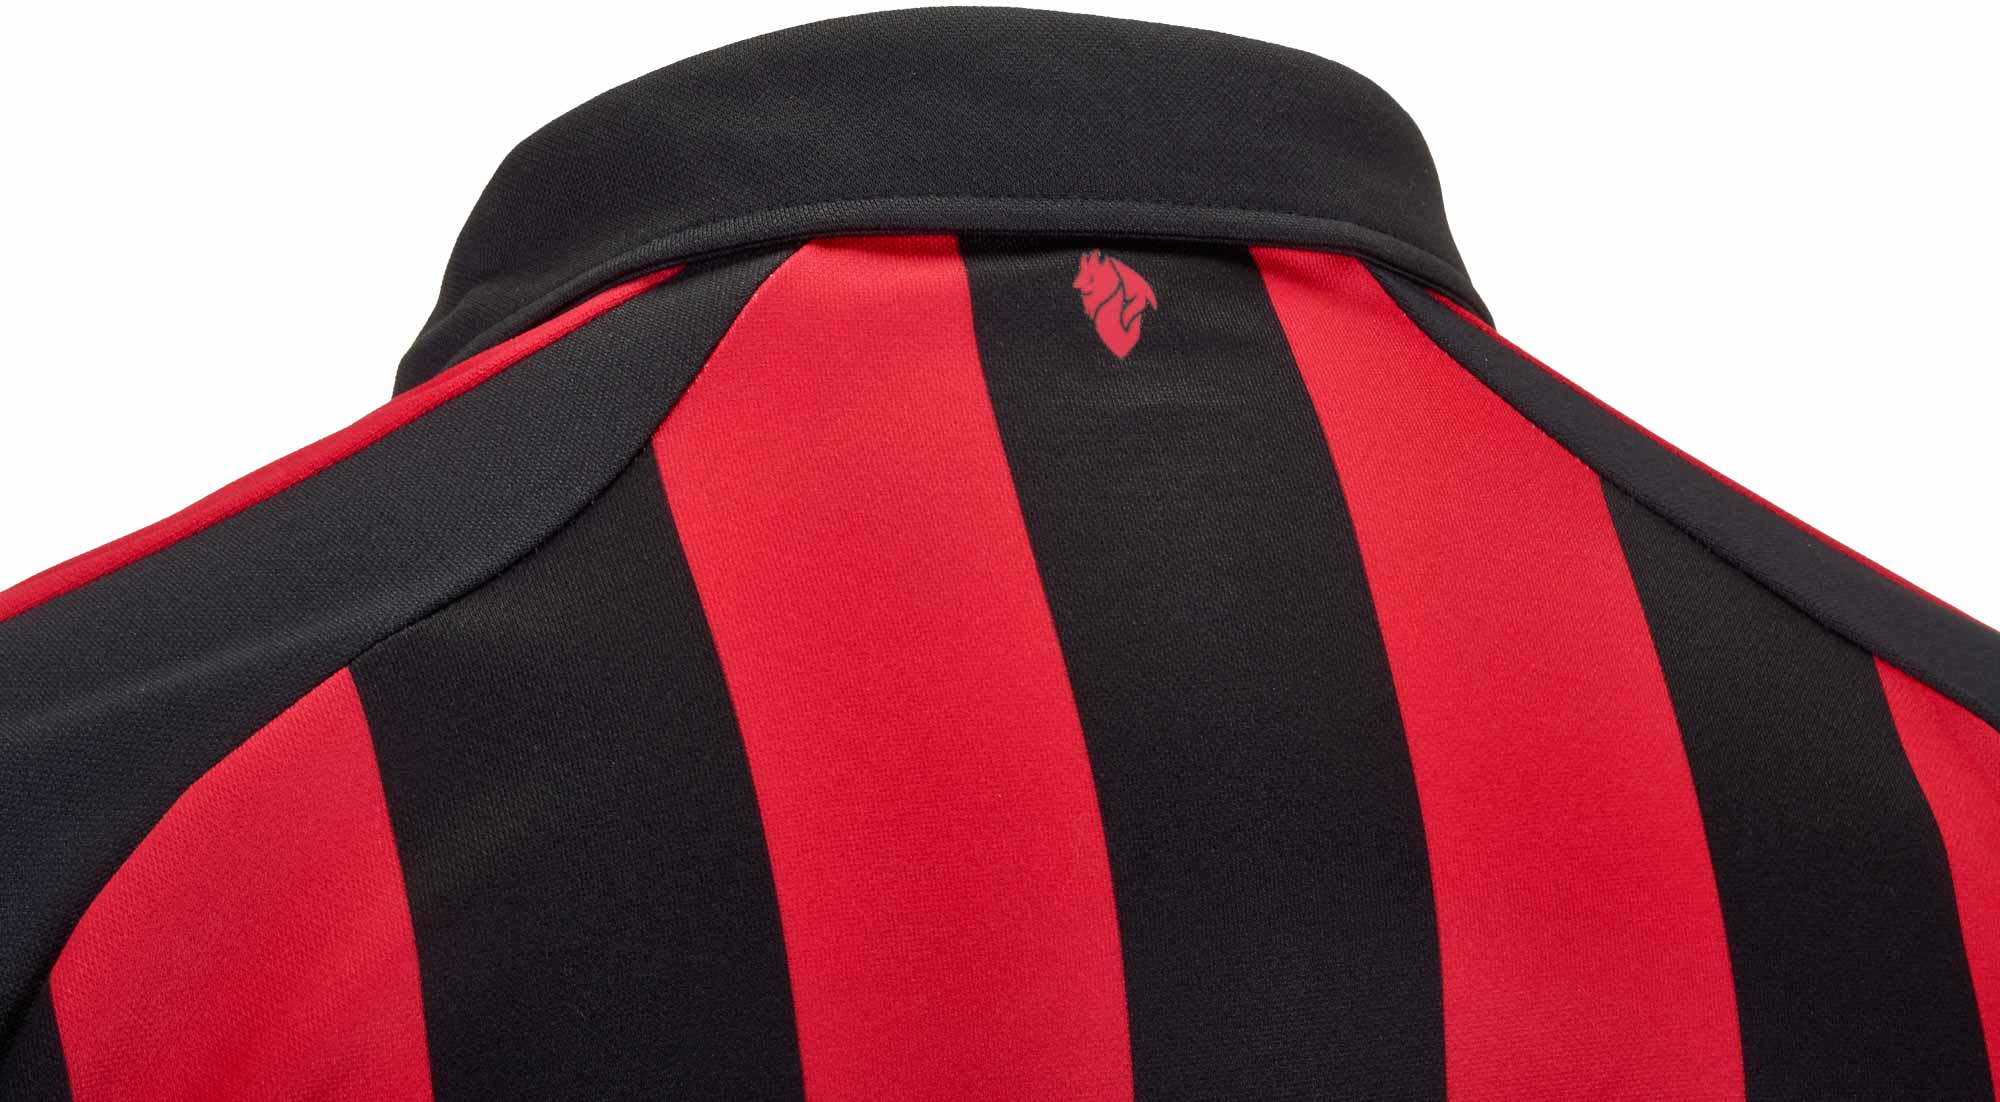 wholesale dealer 8f9ff 874cd PUMA AC Milan Home Jersey - Chili Pepper/Black - SoccerPro